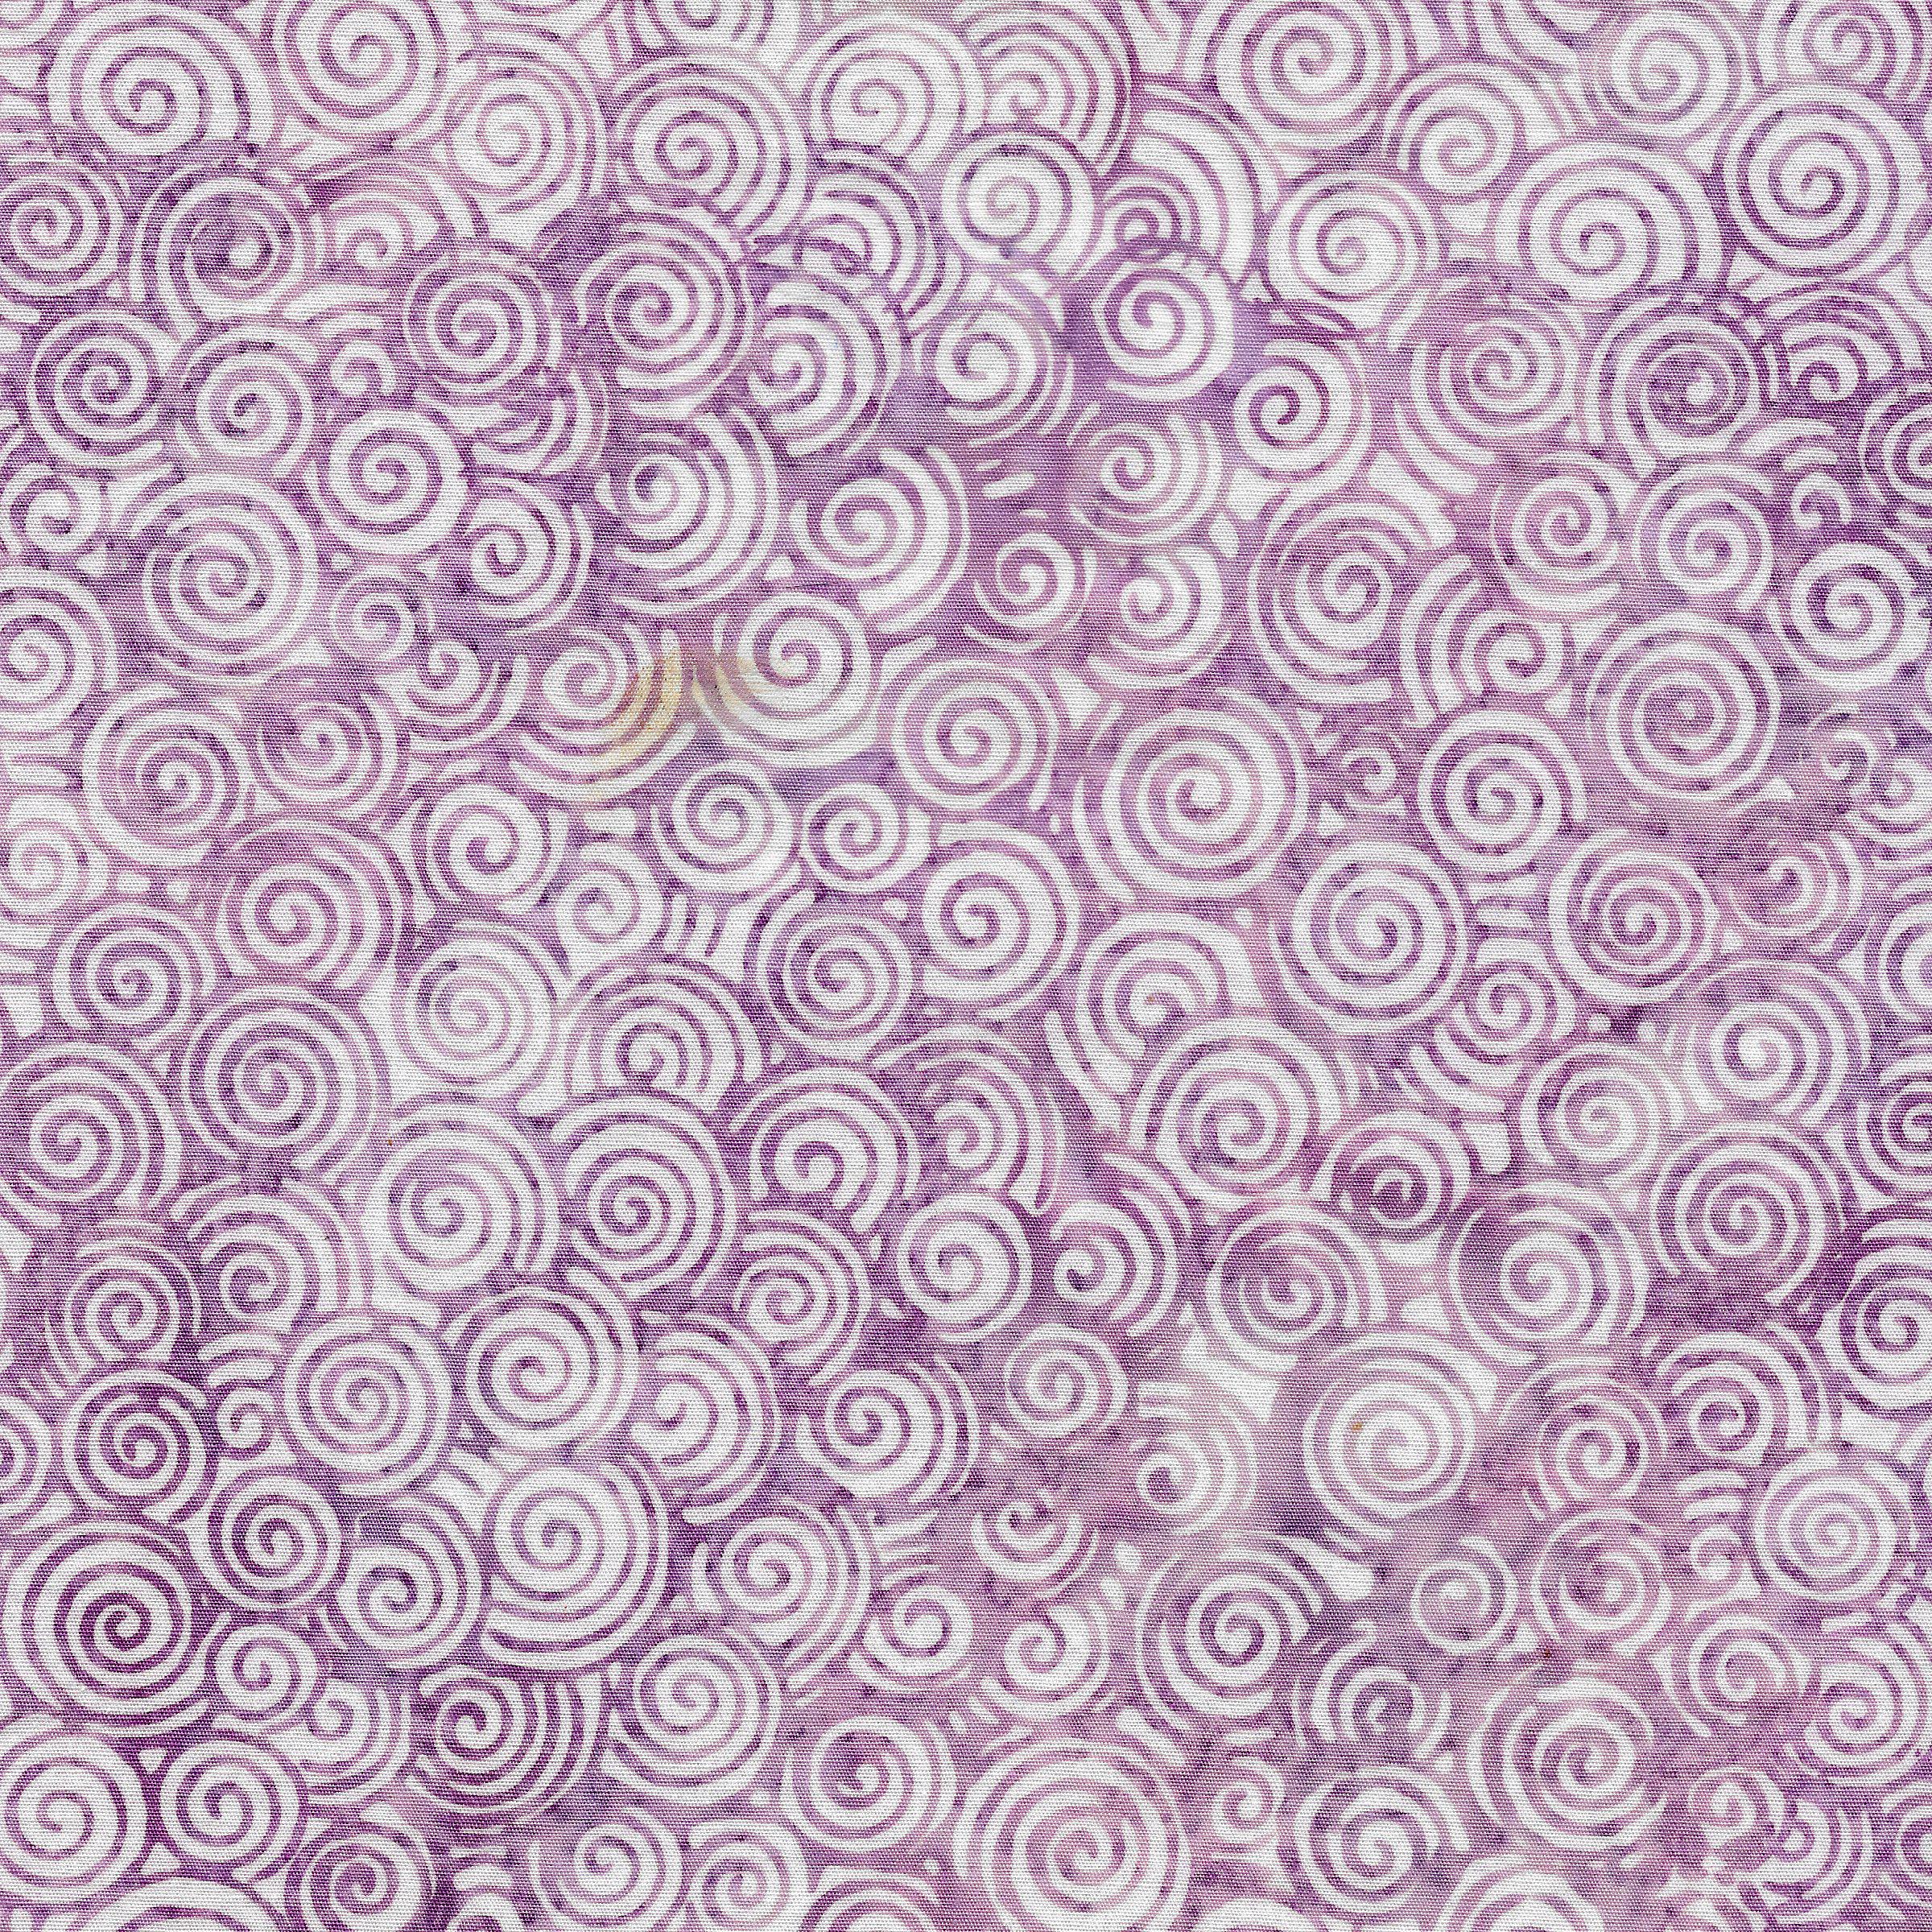 111908401 / Swirls -Thistle